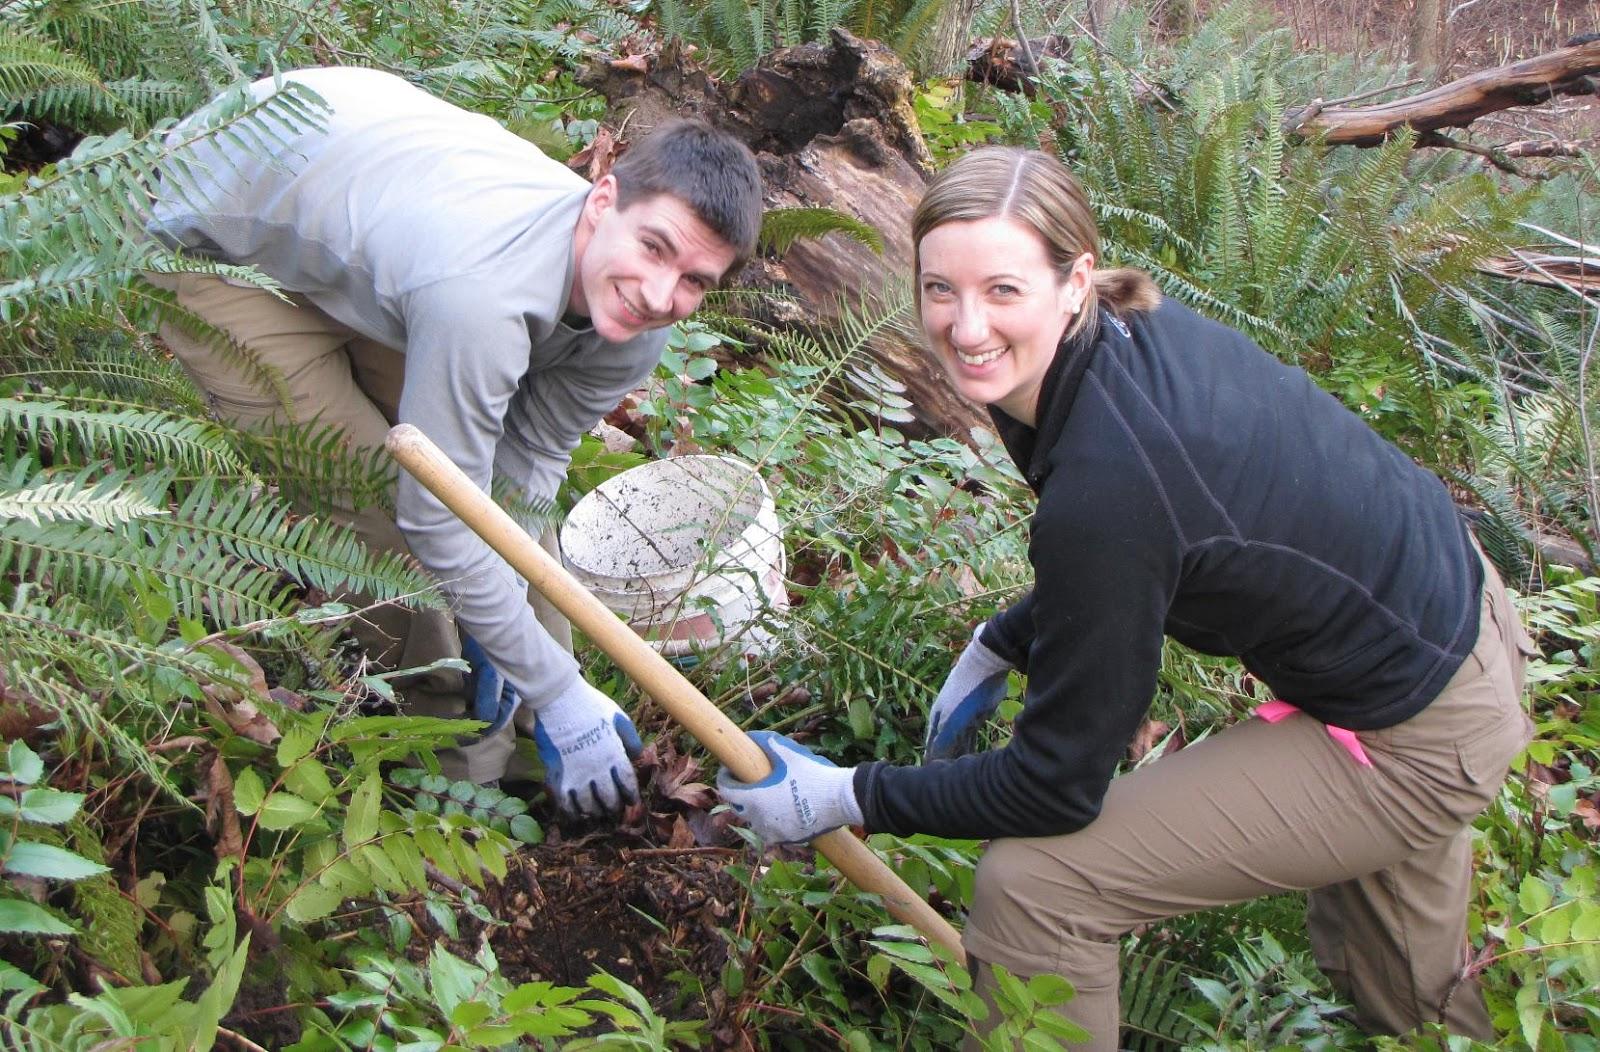 A couple doing volunteering work